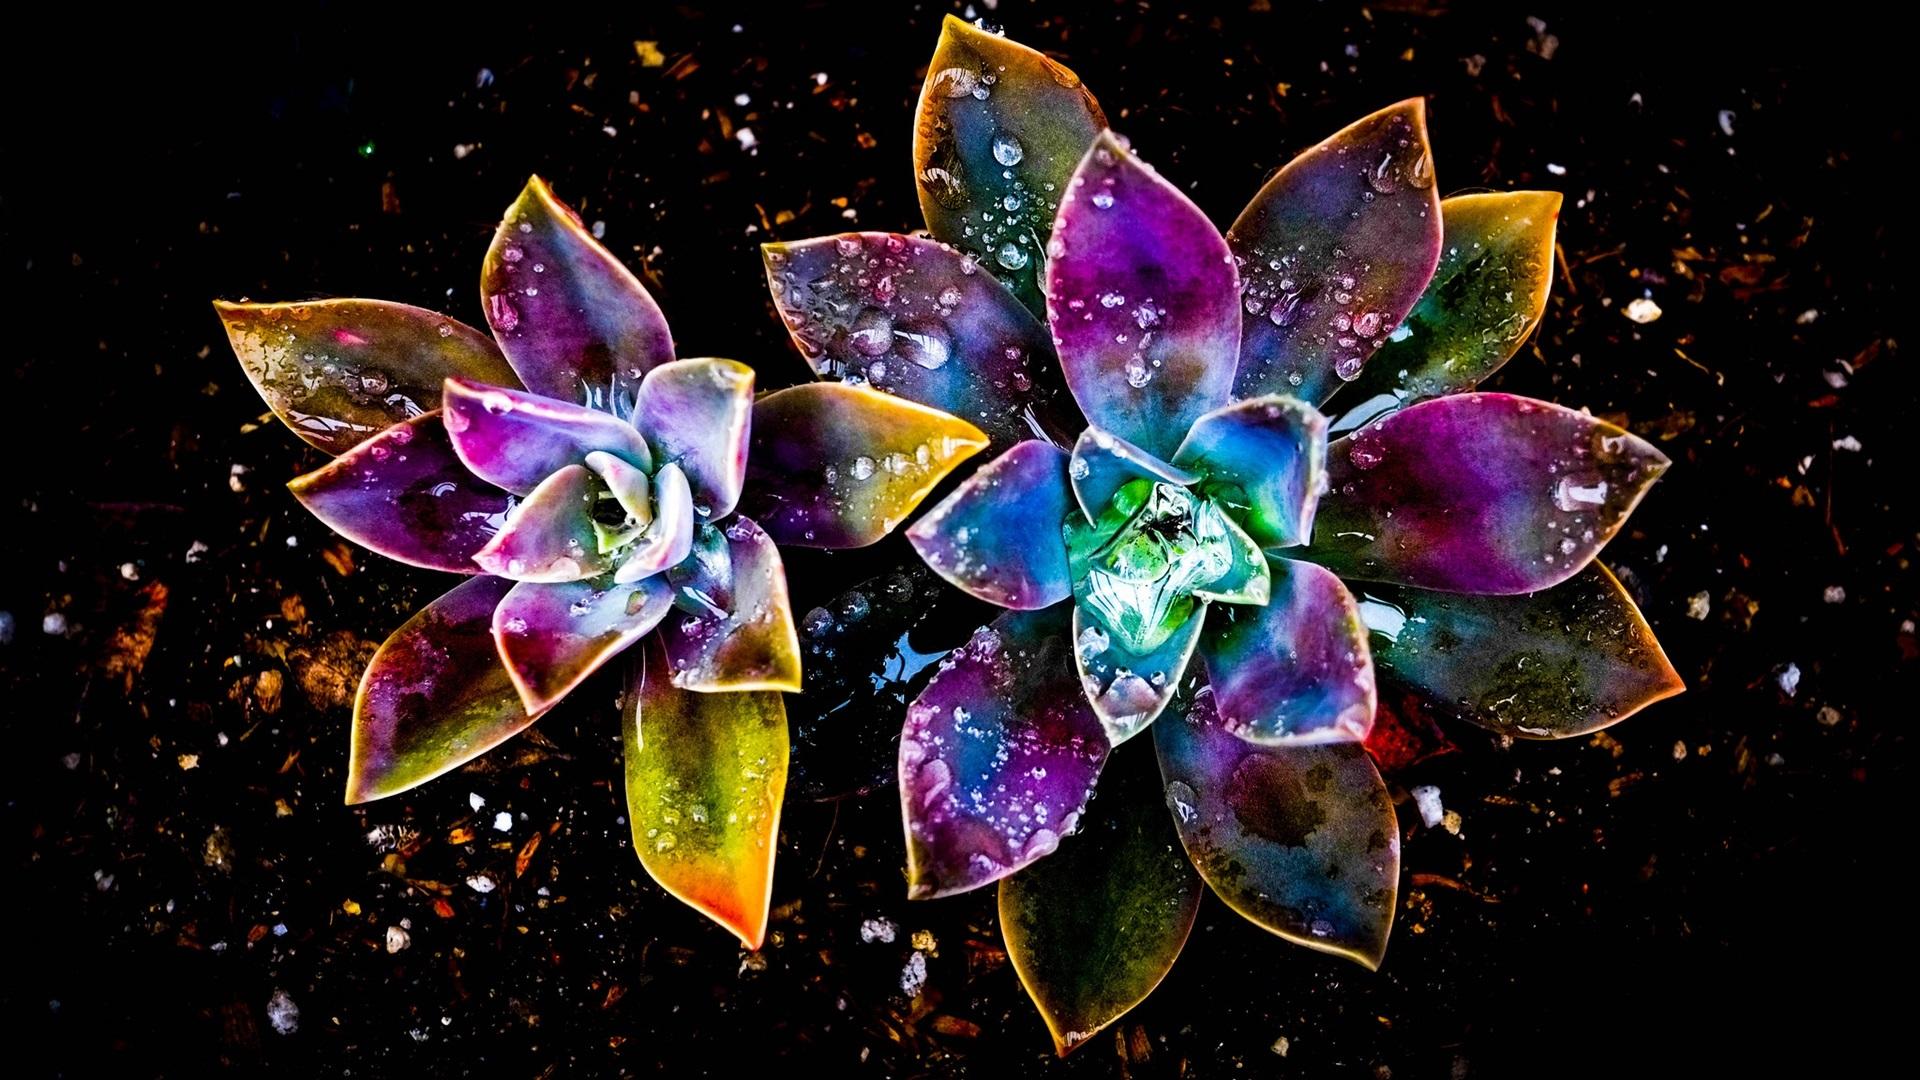 Imagenes Coloridas De Fondo: Fondos De Pantalla Coloridas Flores, Abstracto, Gota De